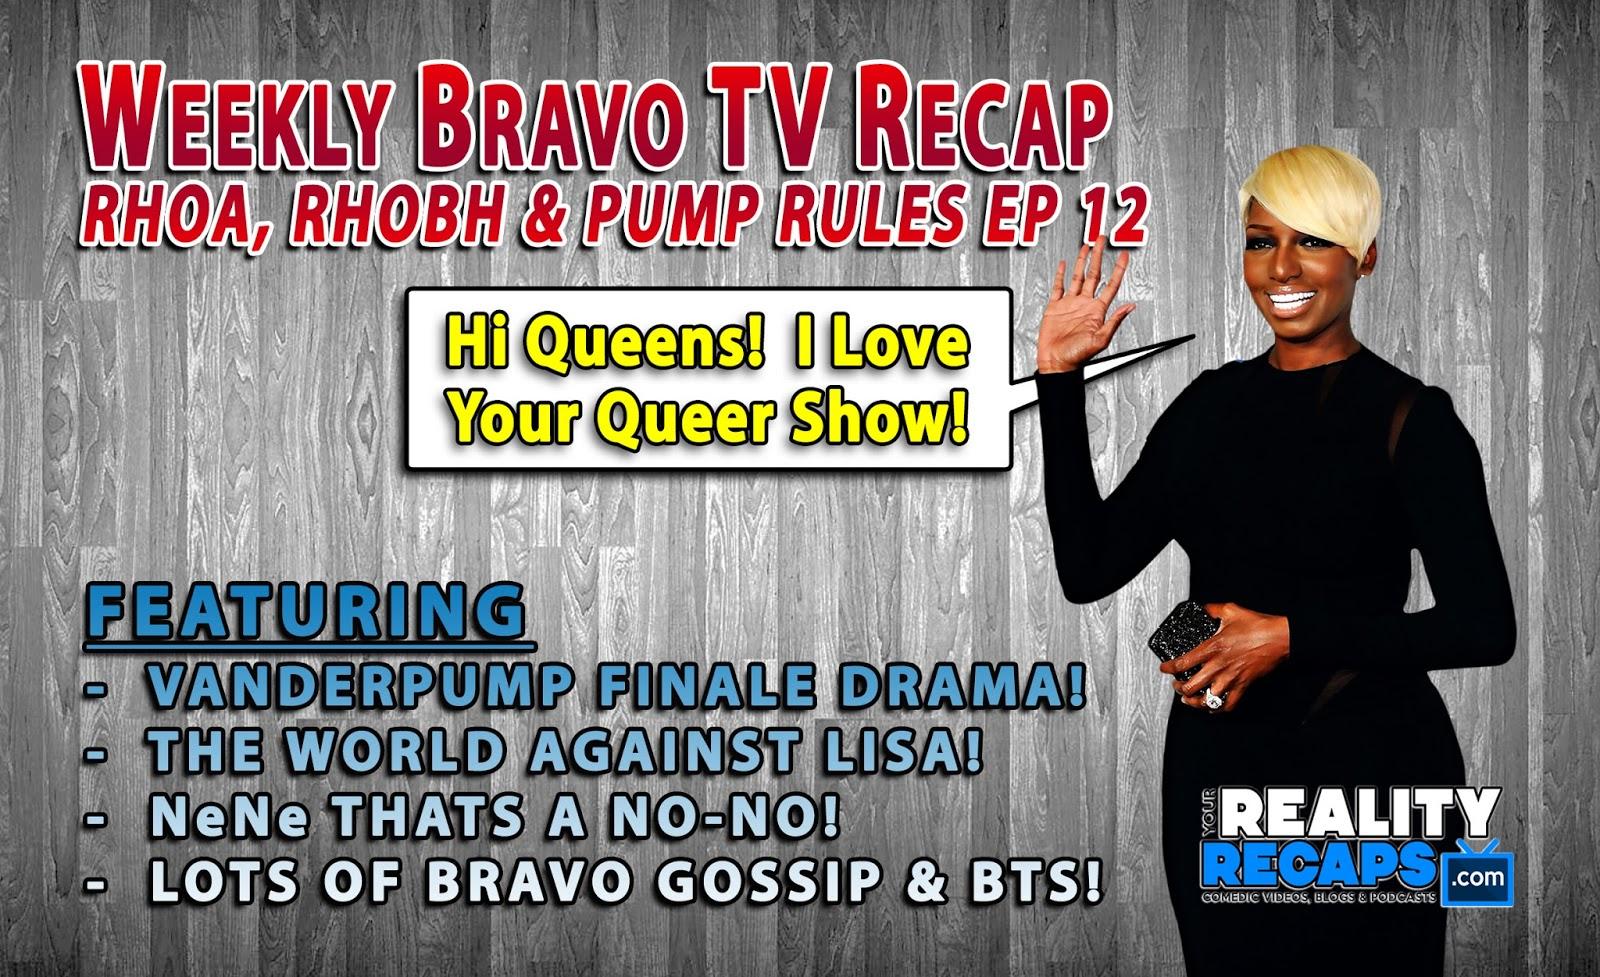 Bravo Weekly Comedic Recap EP 12:  RHOA, RHOBH & Vanderpump Rules Reunion!